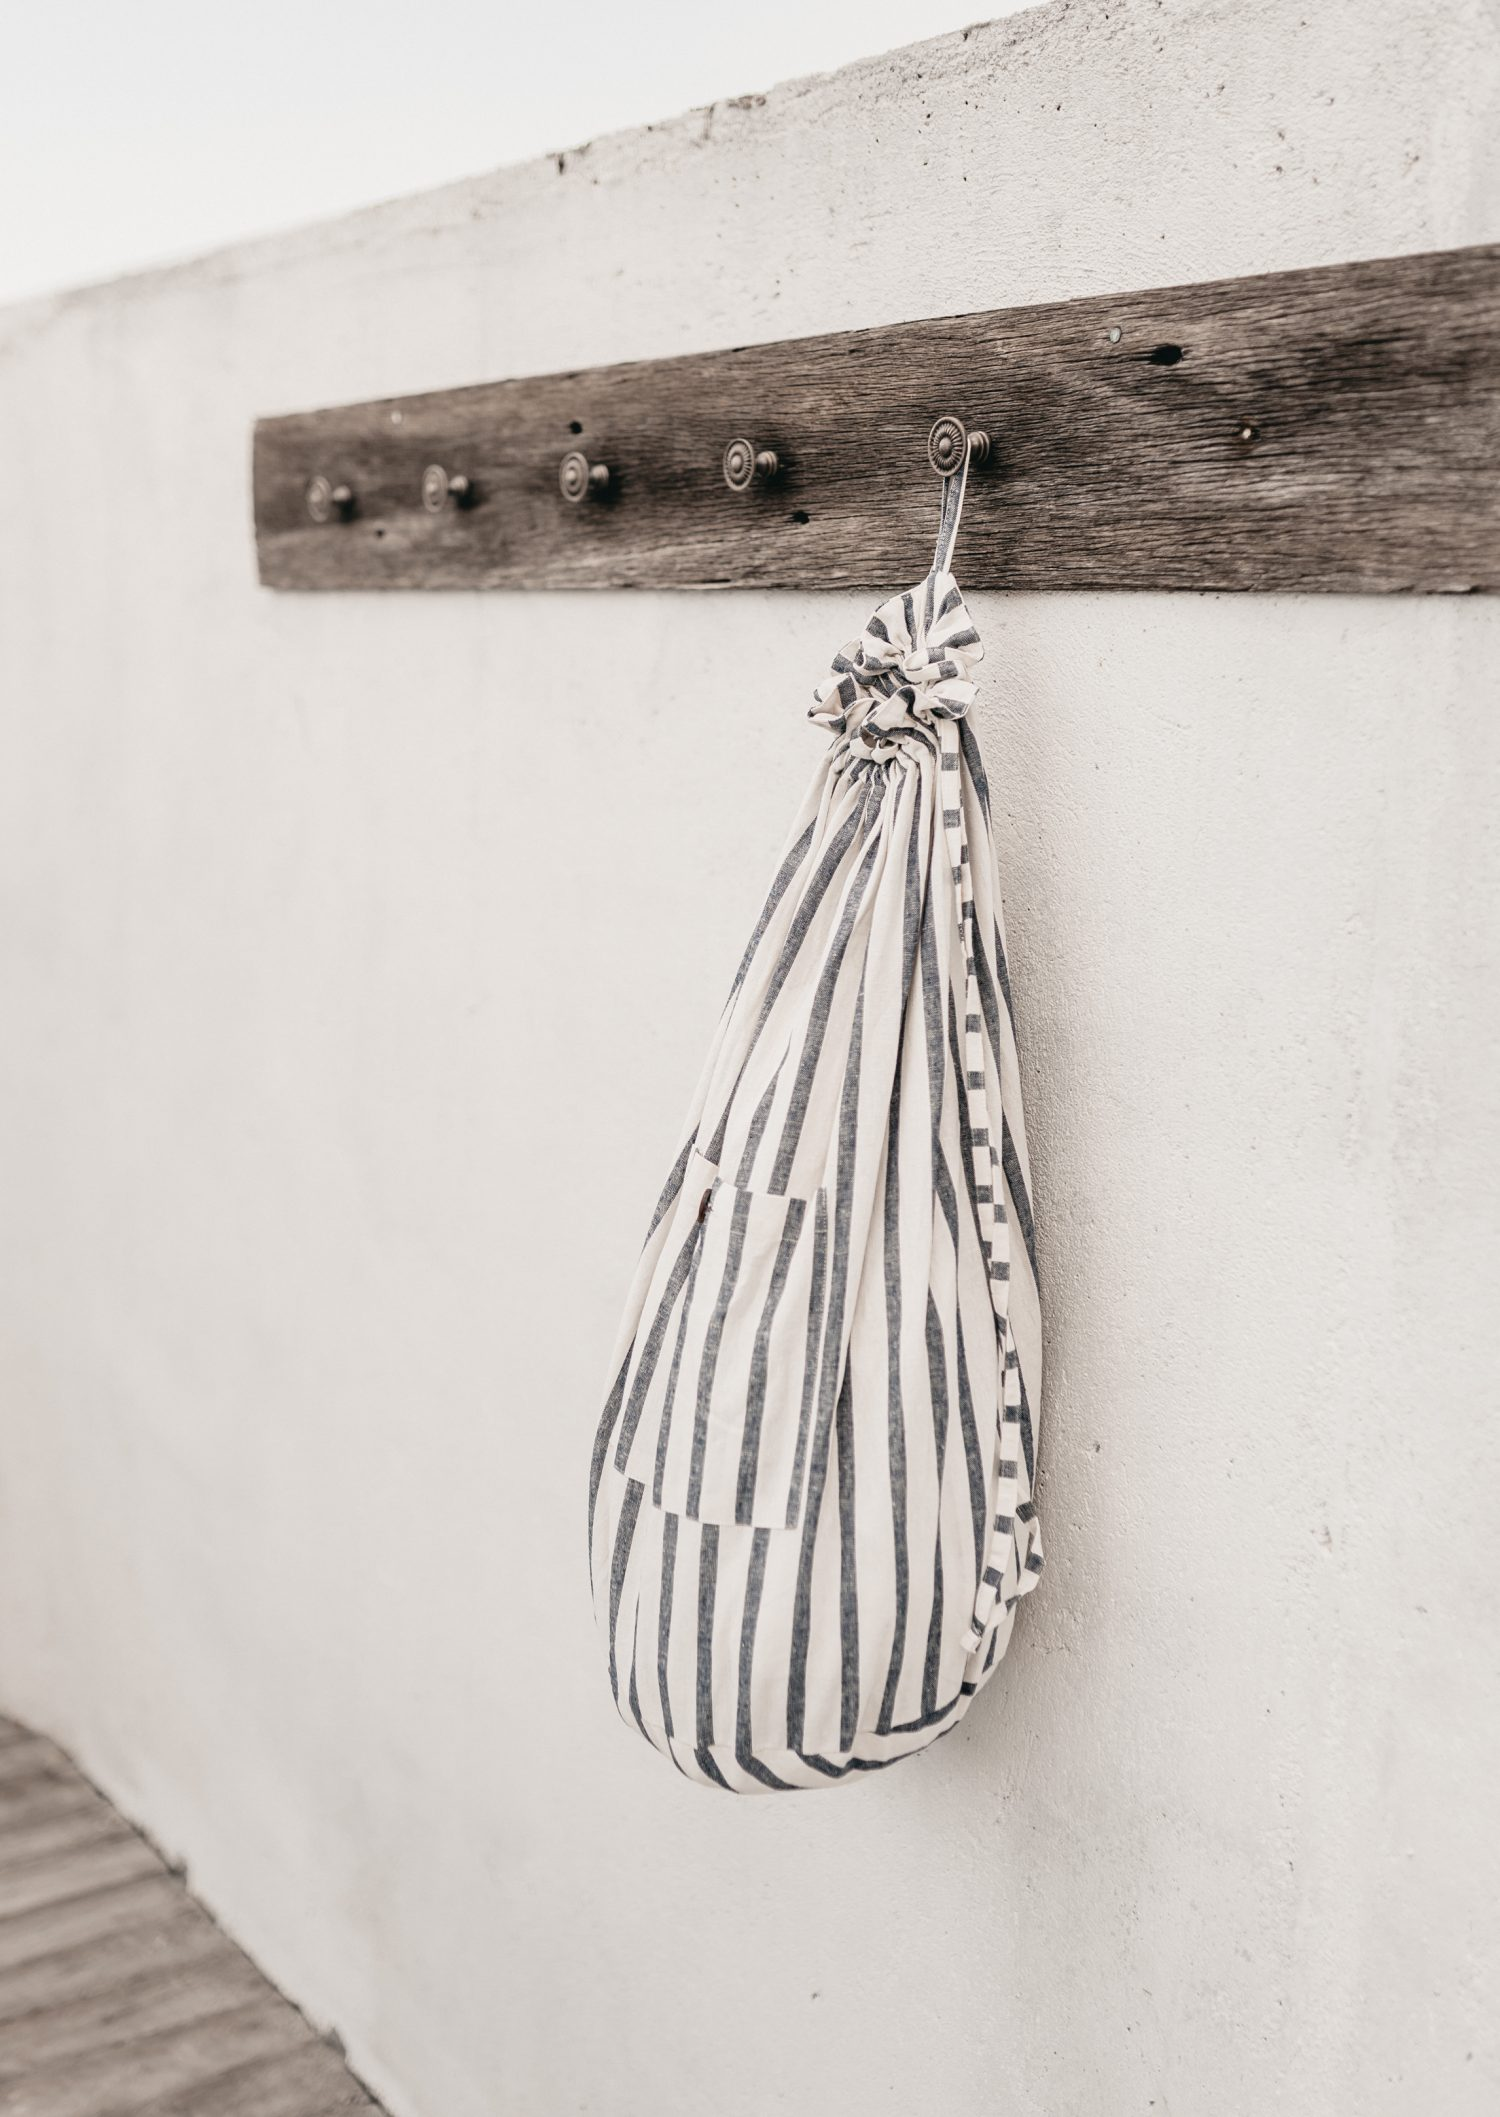 Nowhere & Everywhere Travel Laundry Washing Wash Bag Plastic Free Bag Coconut Buttons Zero Waste Shop Sustainable Ethical Travel